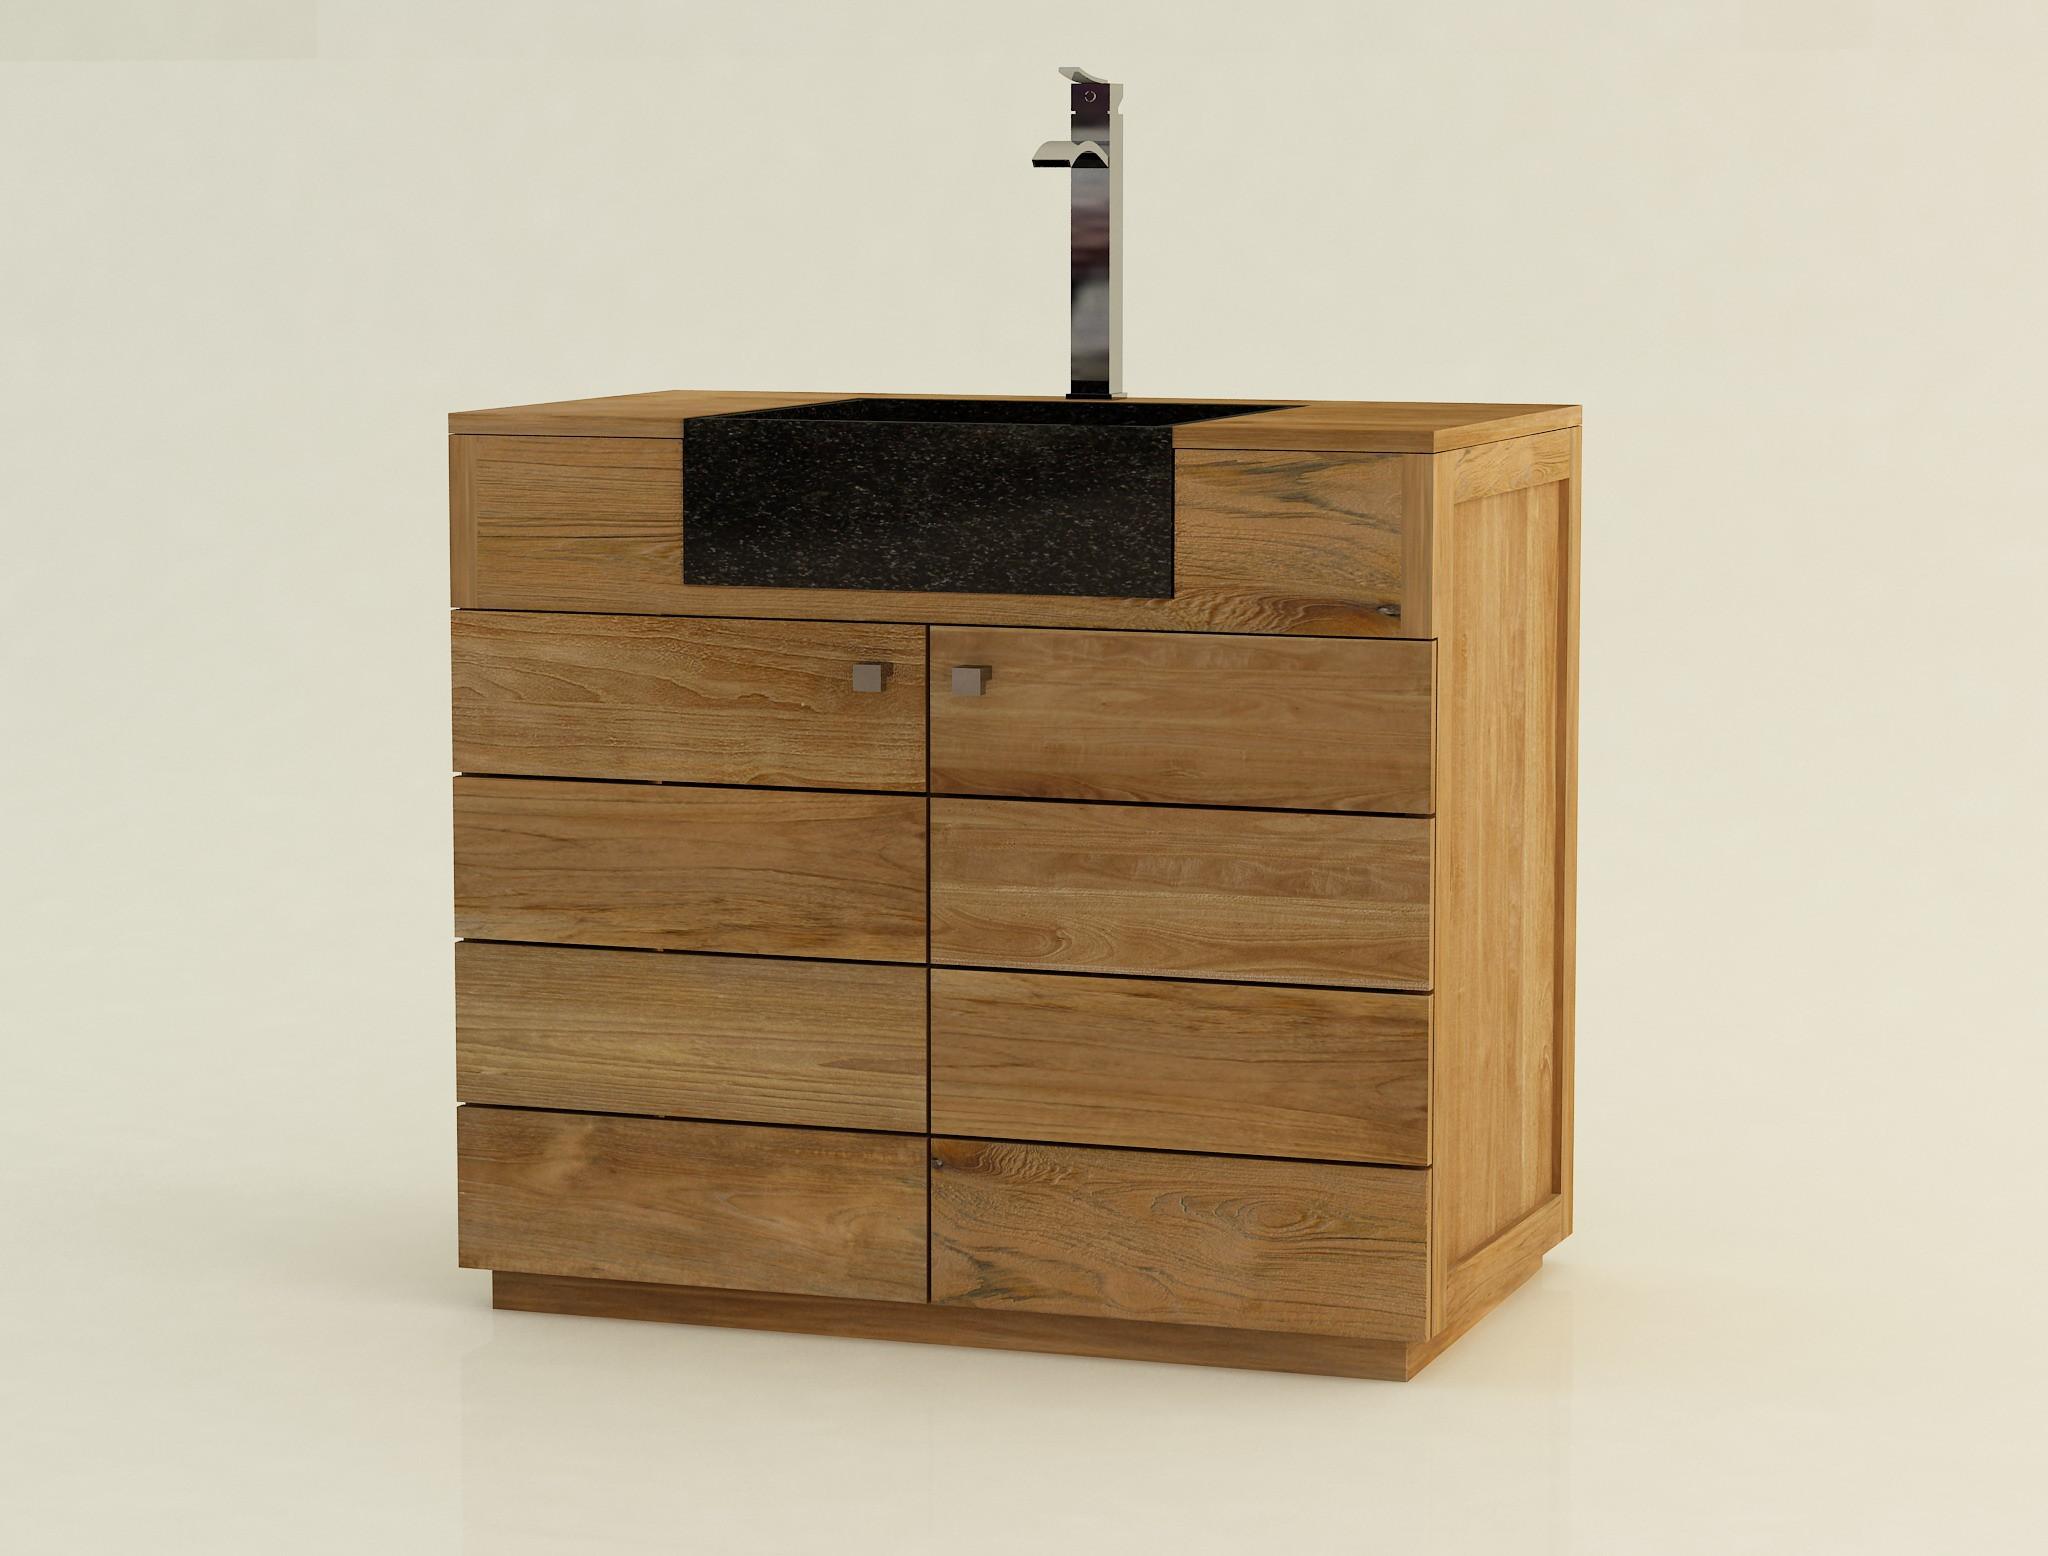 meubles salle de bain en teck cool meubles salle de bain sous lavabo best of meuble salle de. Black Bedroom Furniture Sets. Home Design Ideas